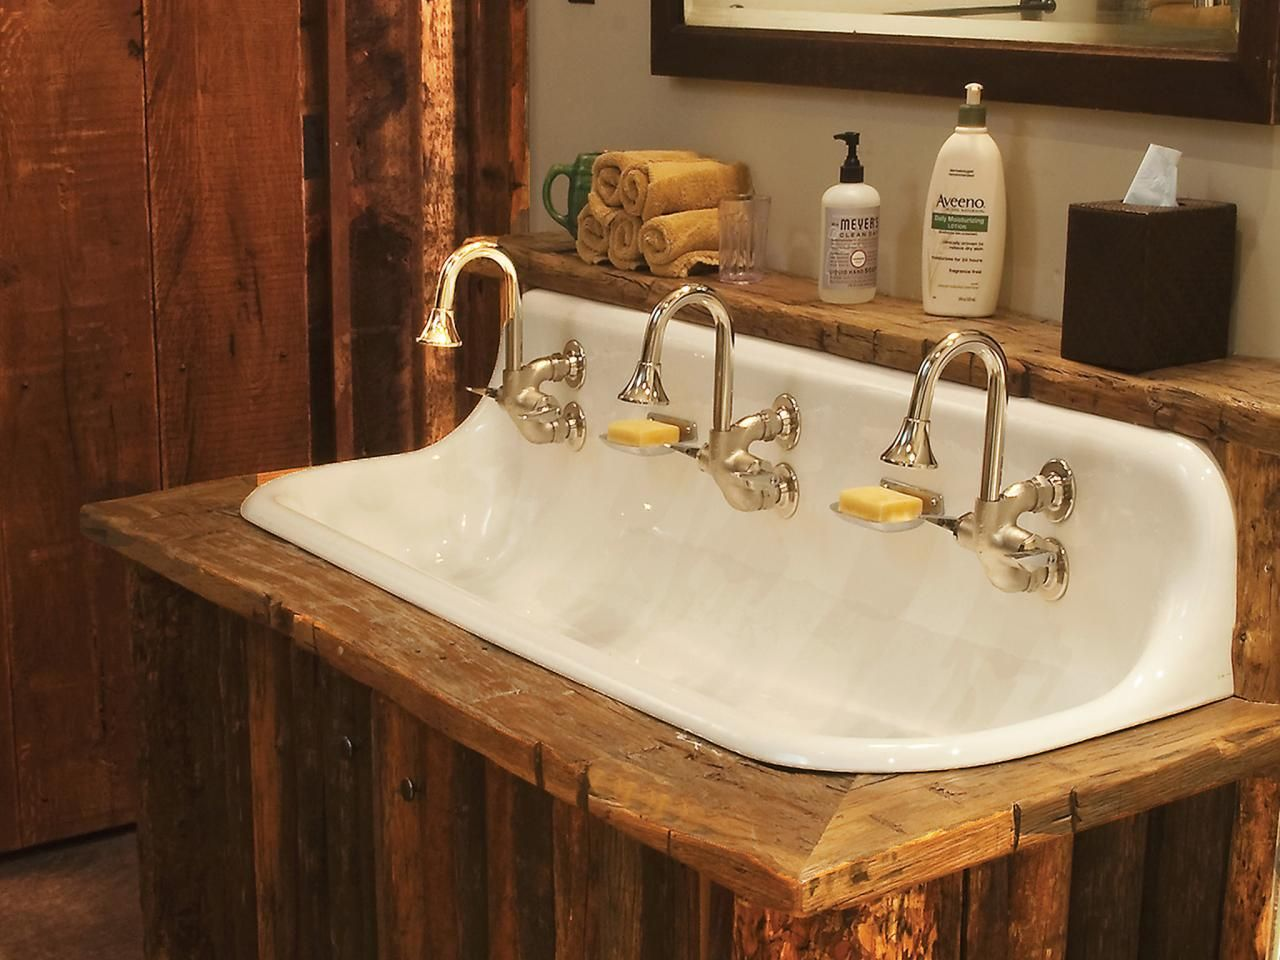 Antique Bathroom Fixtures | Rustic bathrooms, Rustic elegance and Sinks